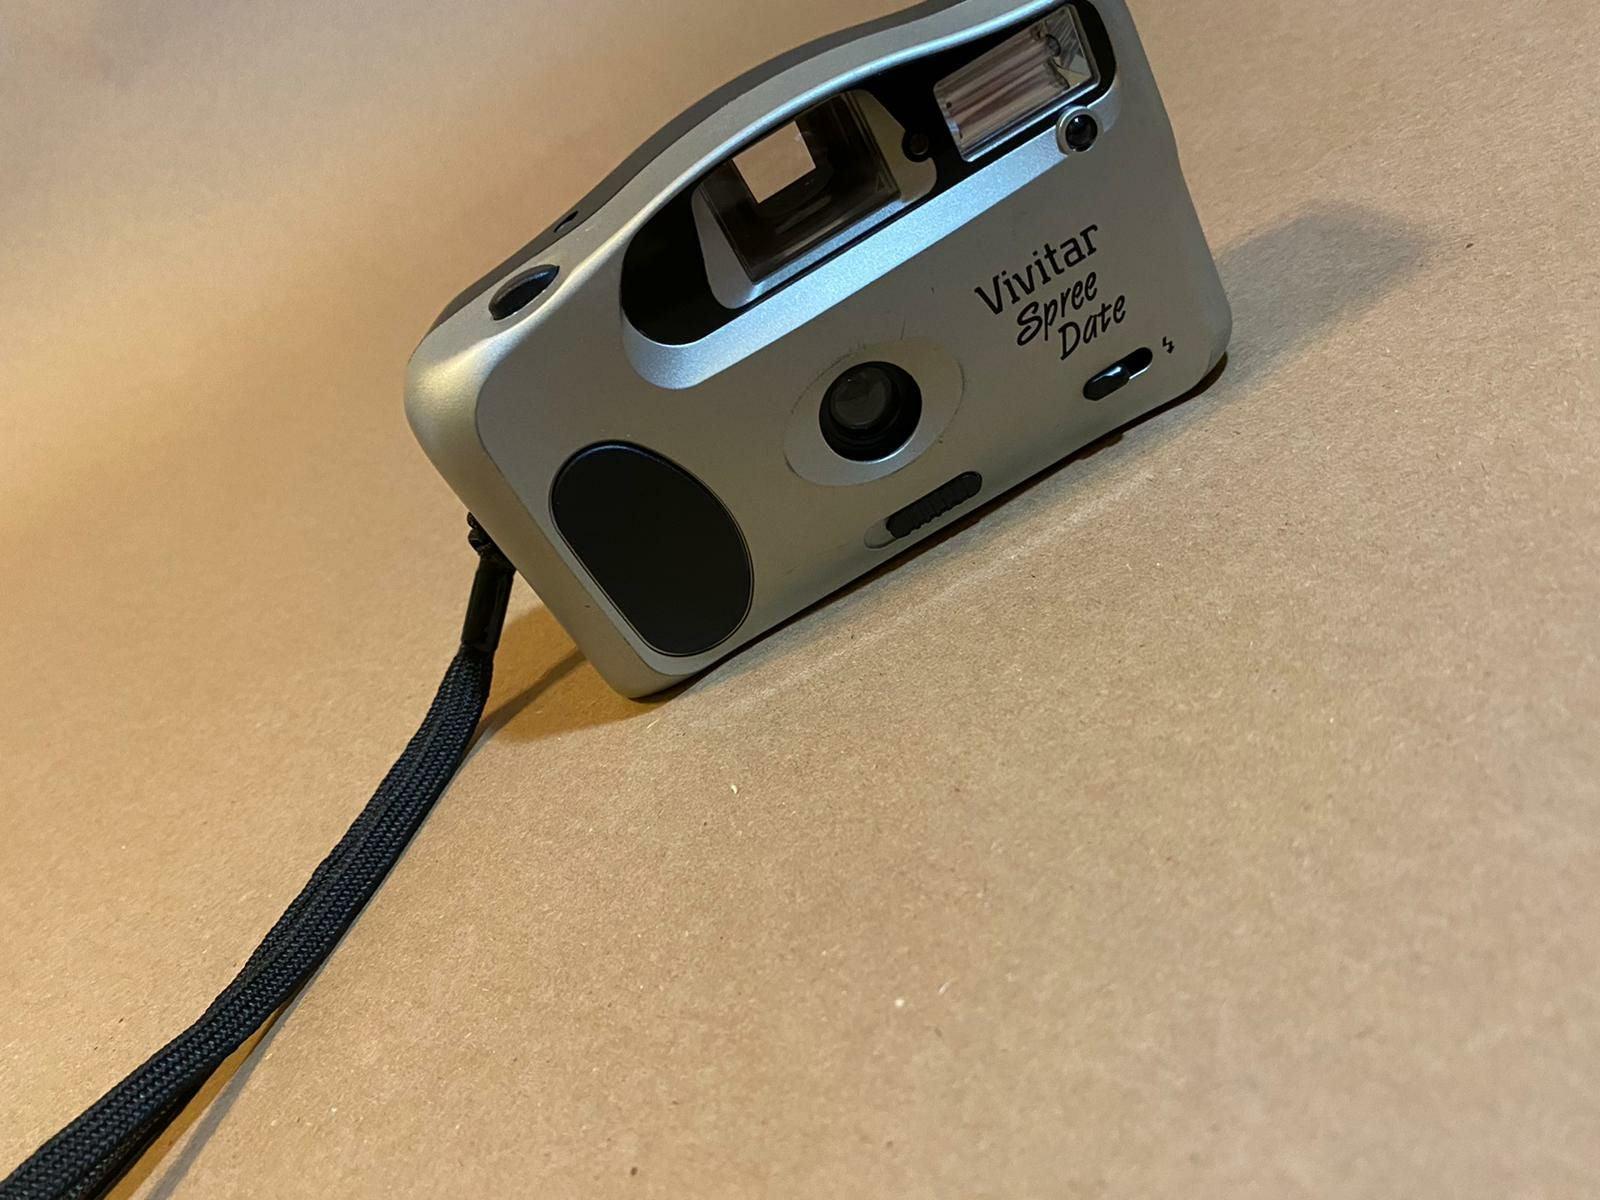 Vivitar Spree Date Film Camera